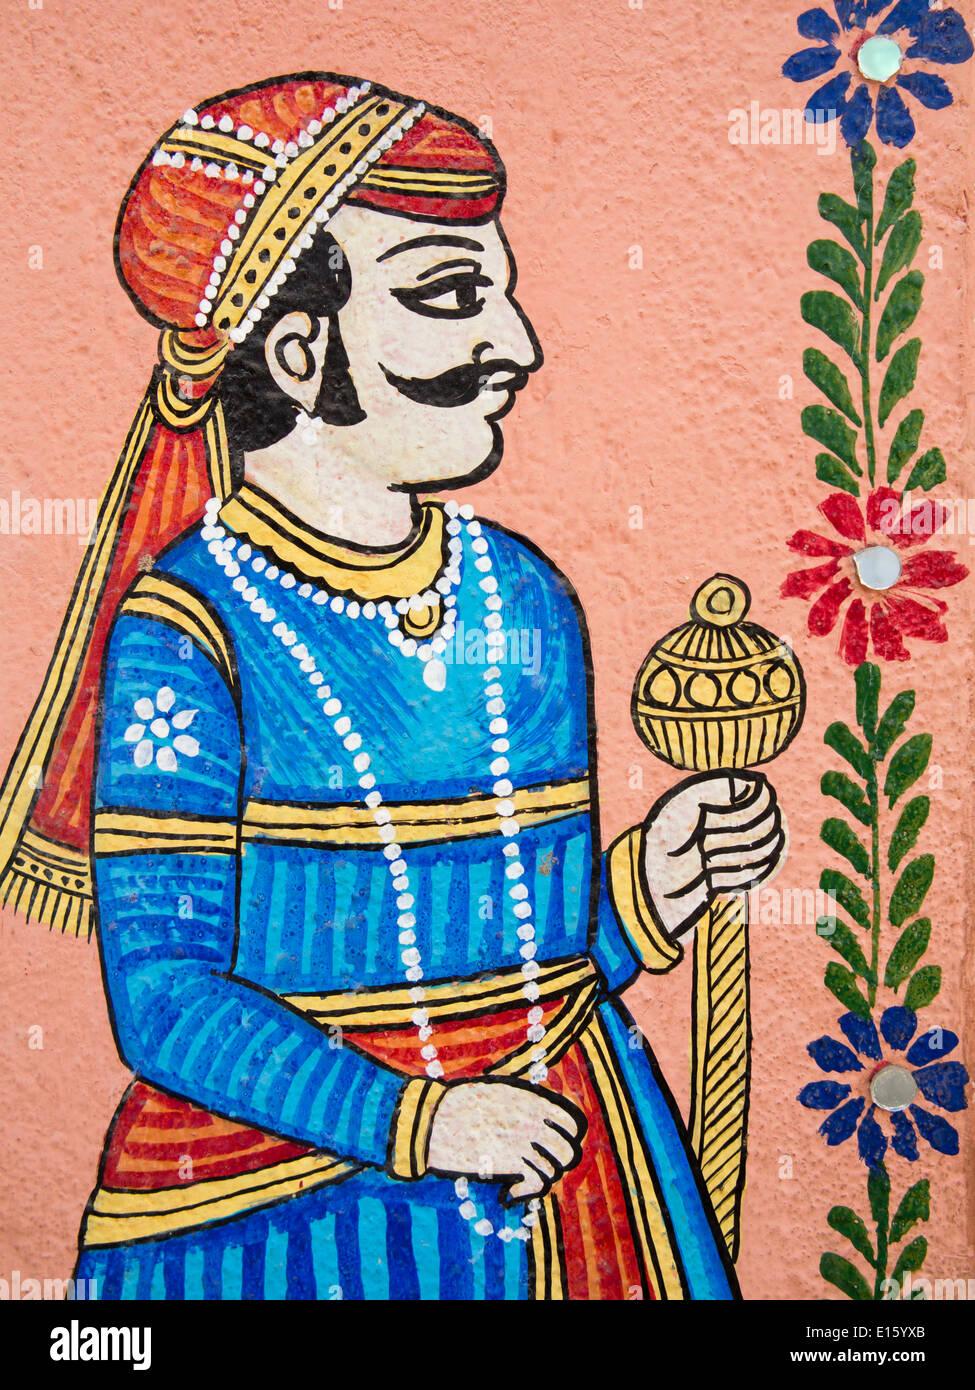 Rajput Painting Rajasthani Stock Photos Amp Rajput Painting